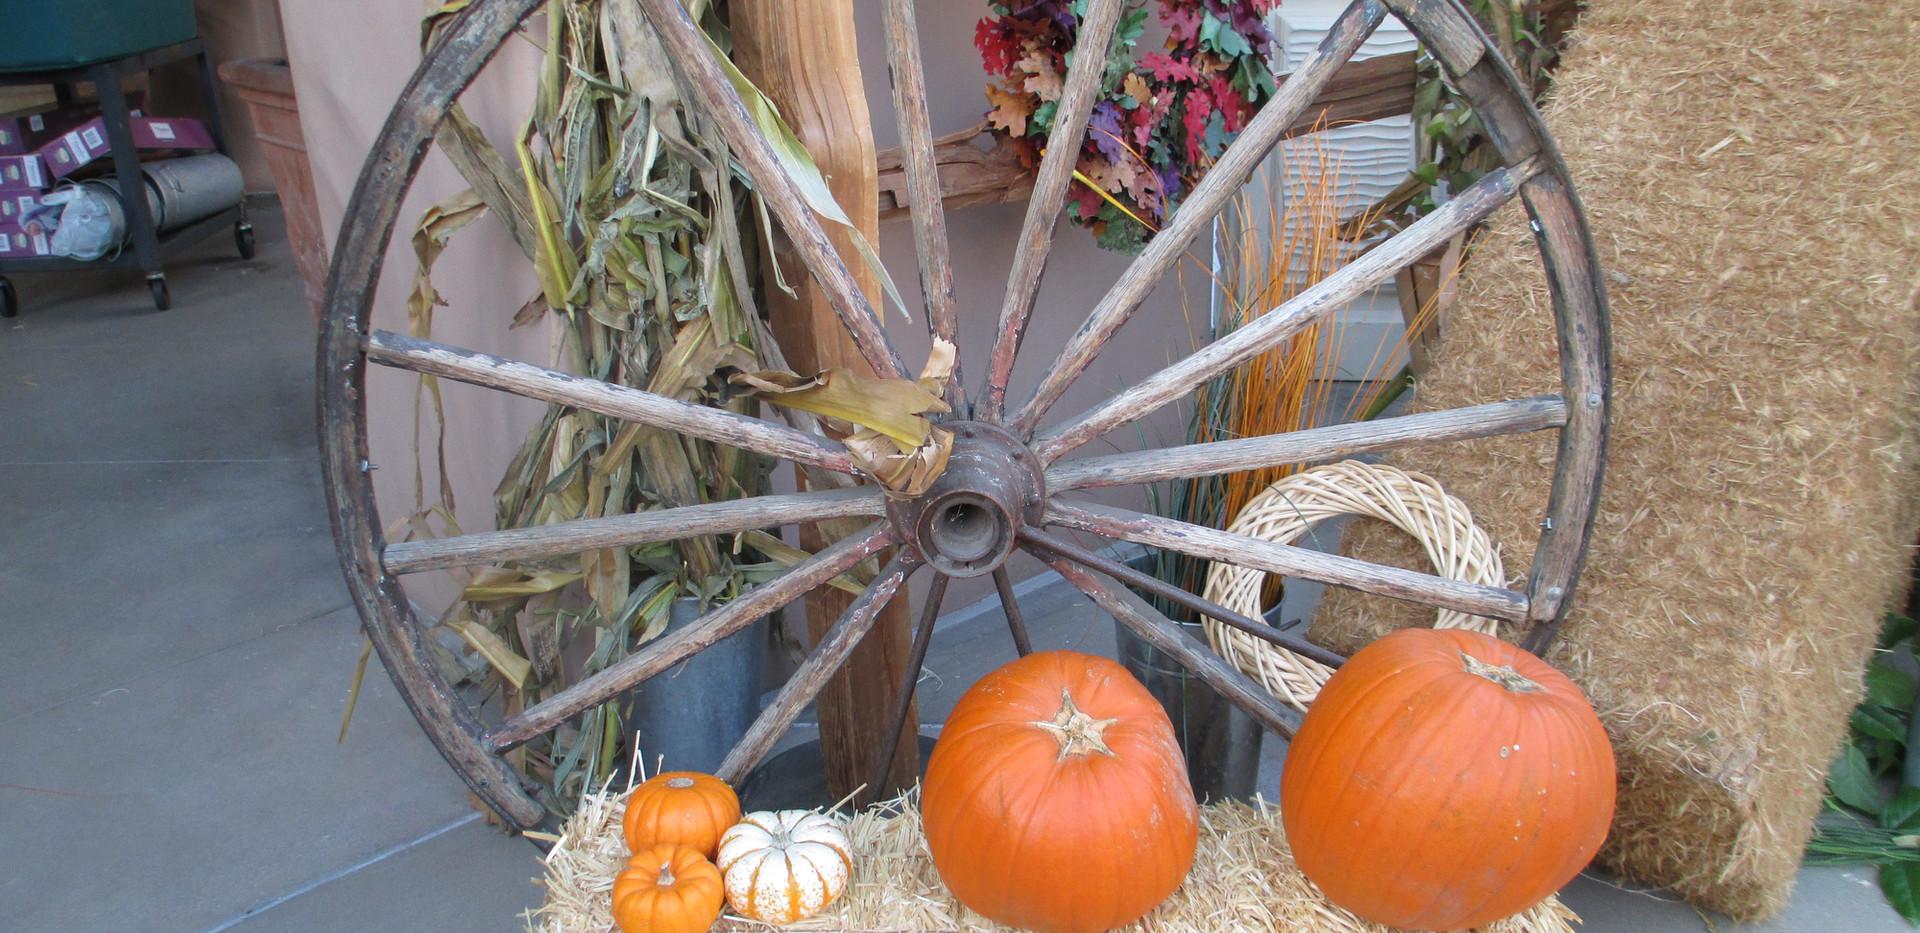 Wagon Wheel Vignette